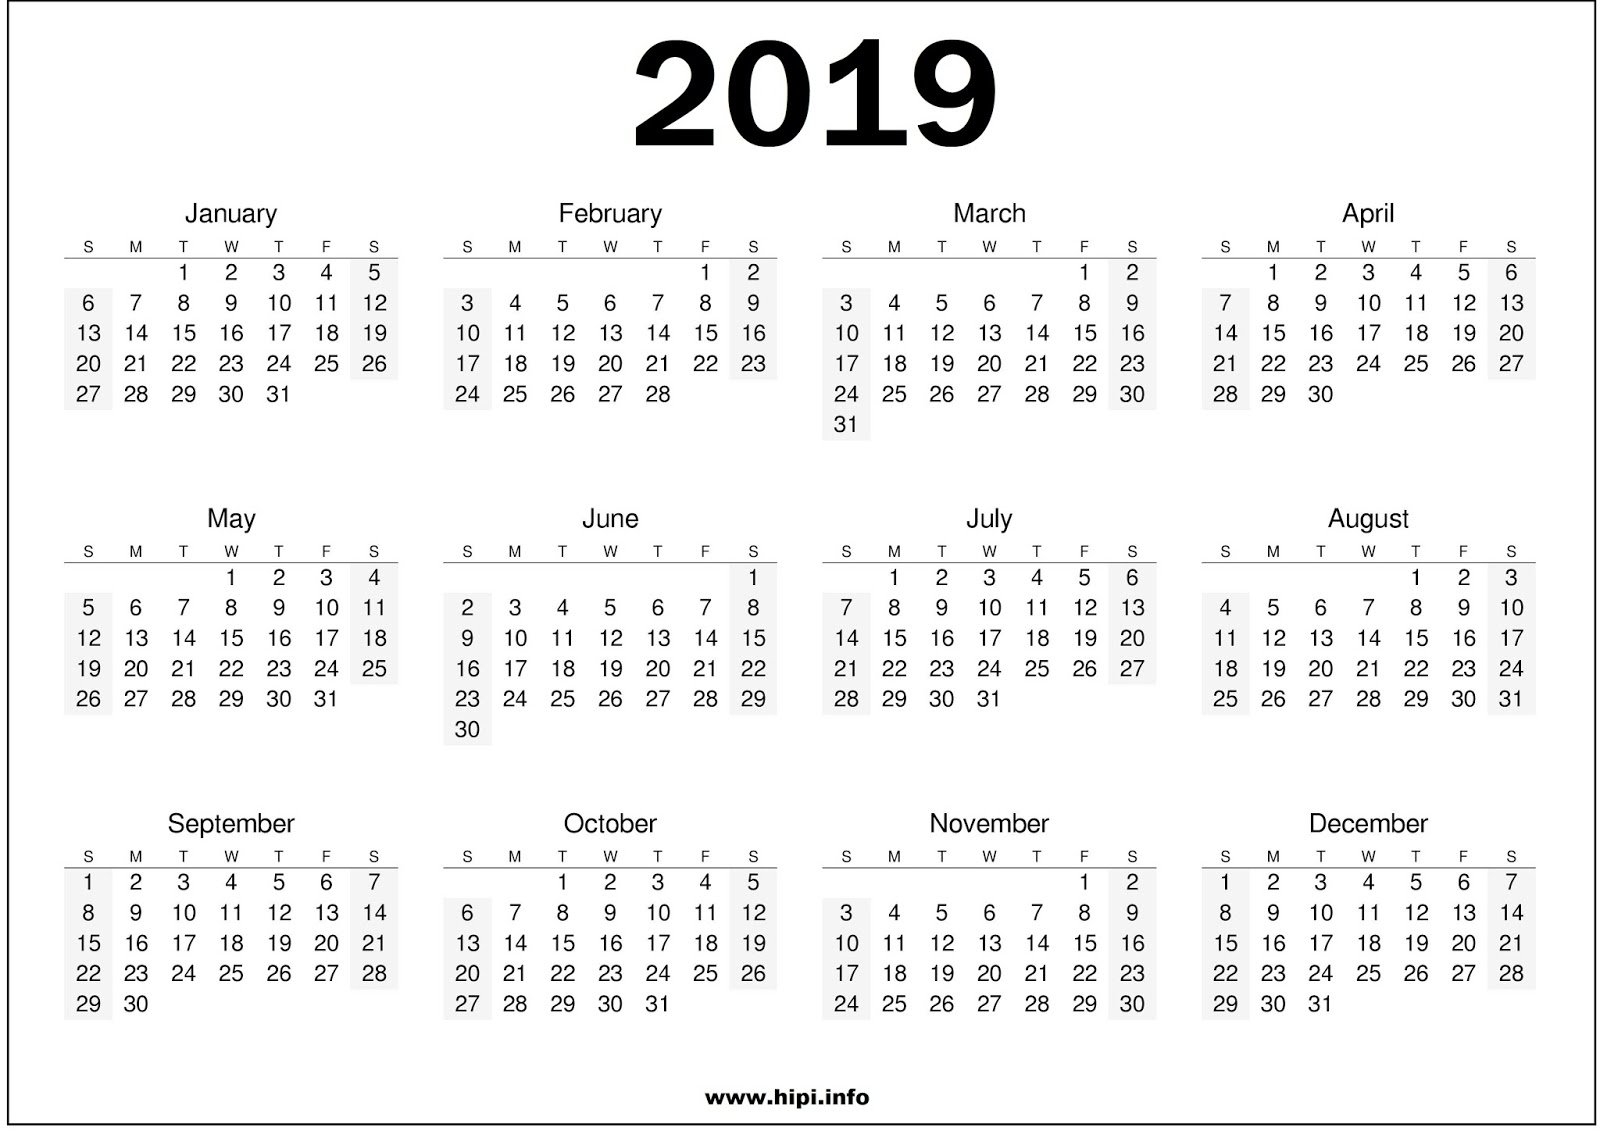 2019-Calendar-Printable-Free007 - Addicted2Adventure 007 Calendar 2019